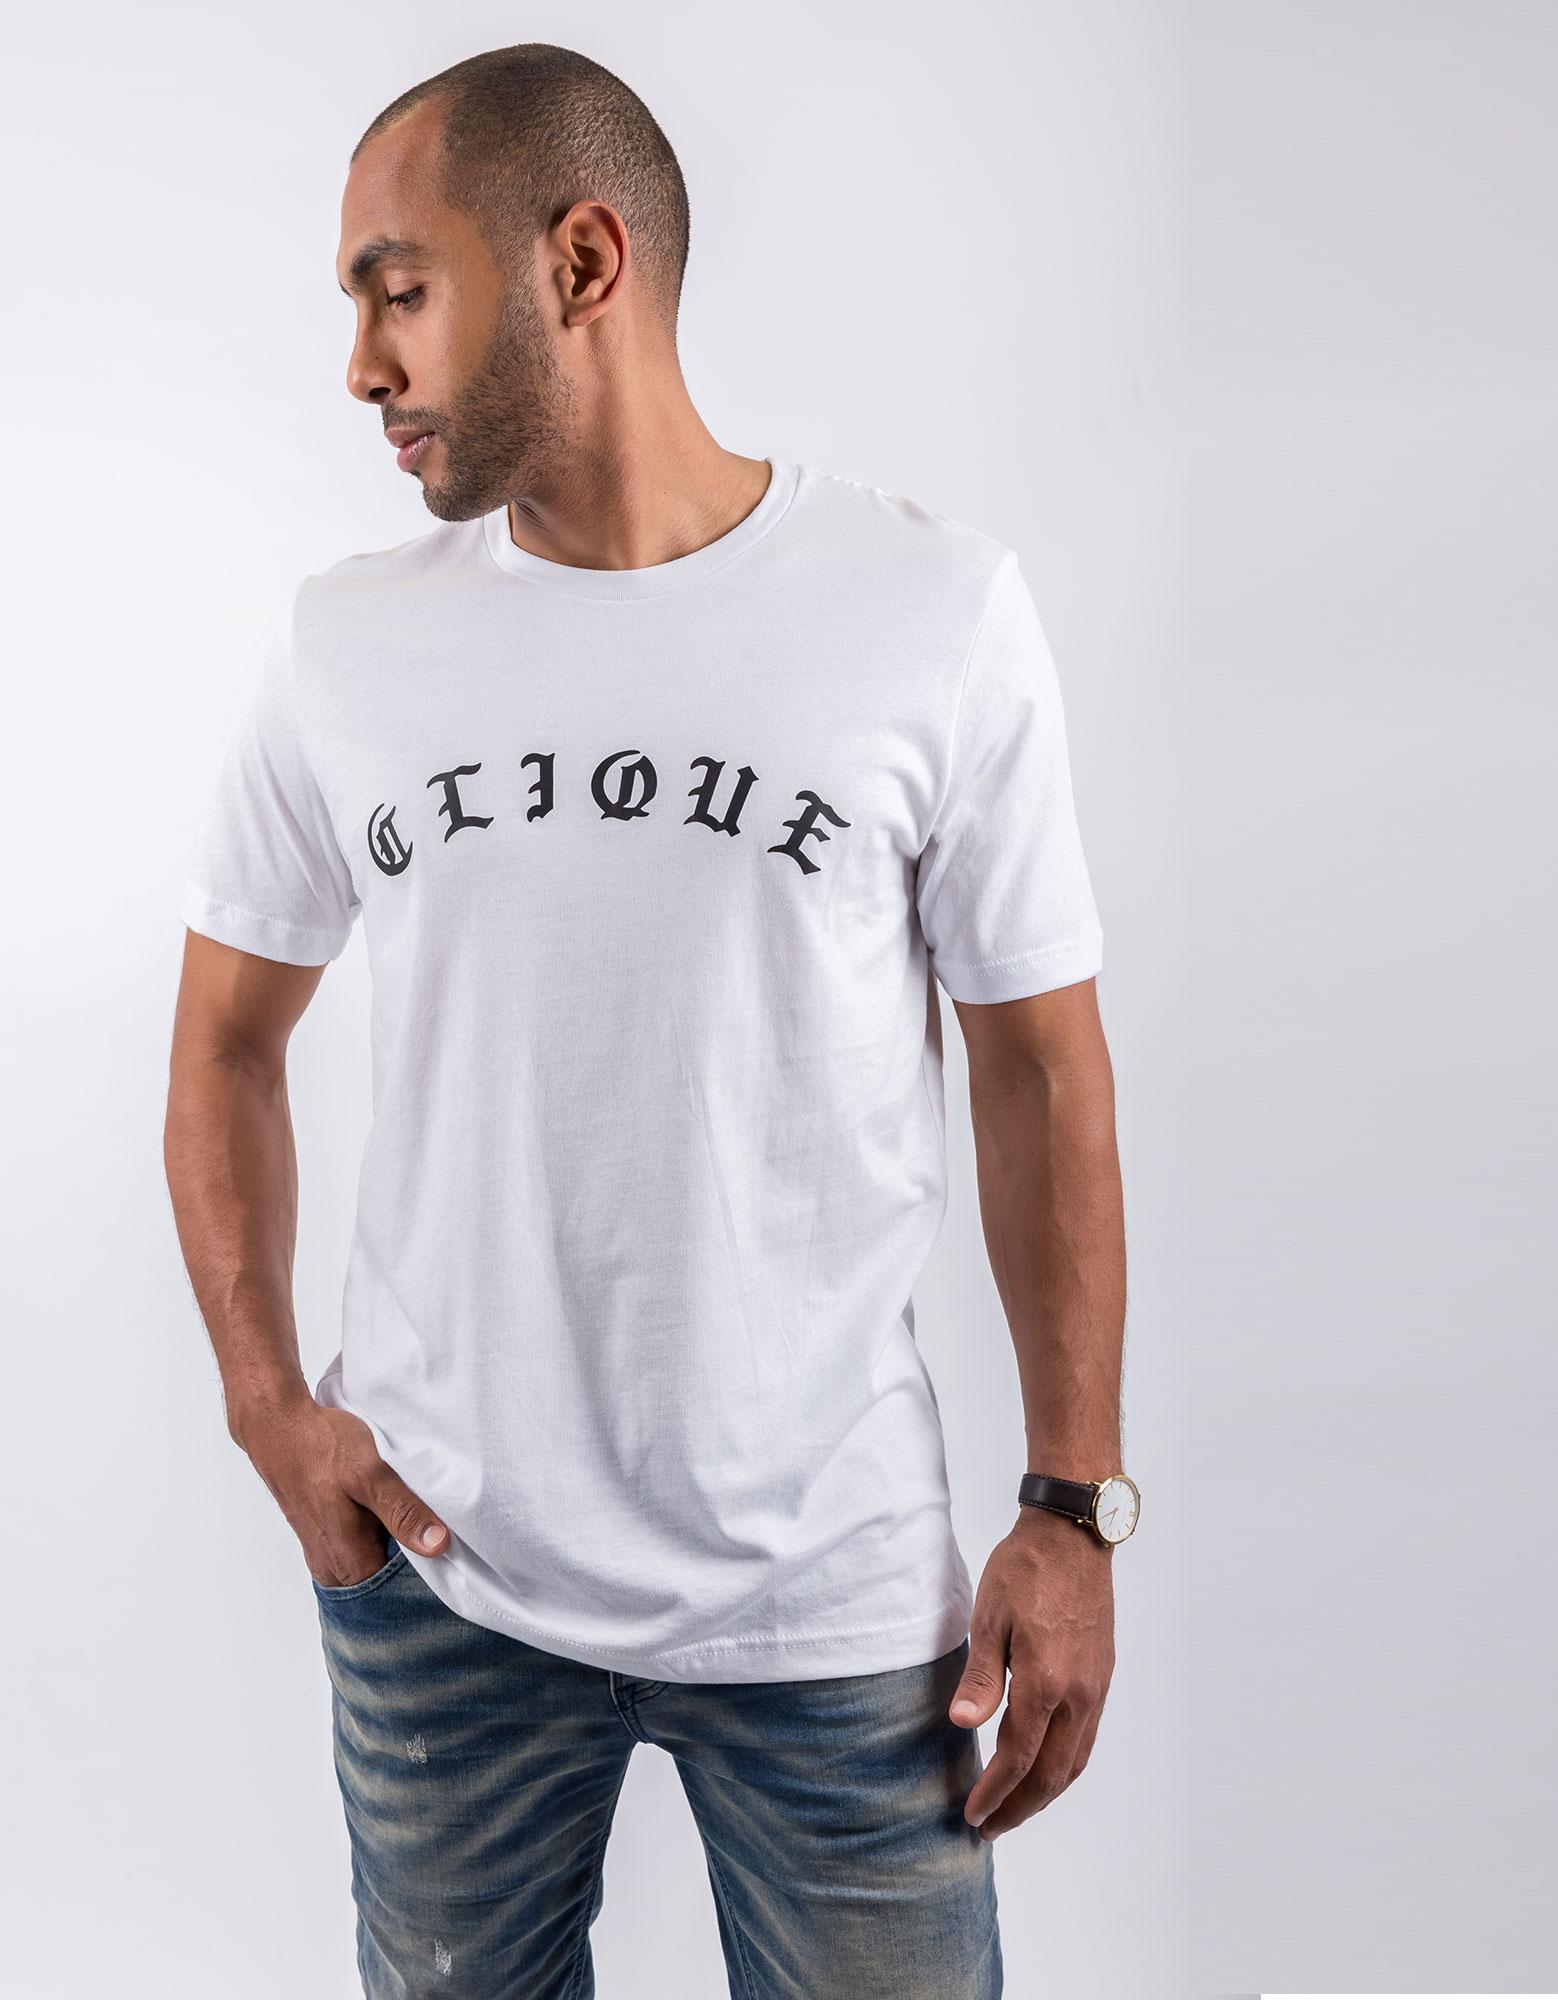 Save The People Clique White Unisex T-Shirt M